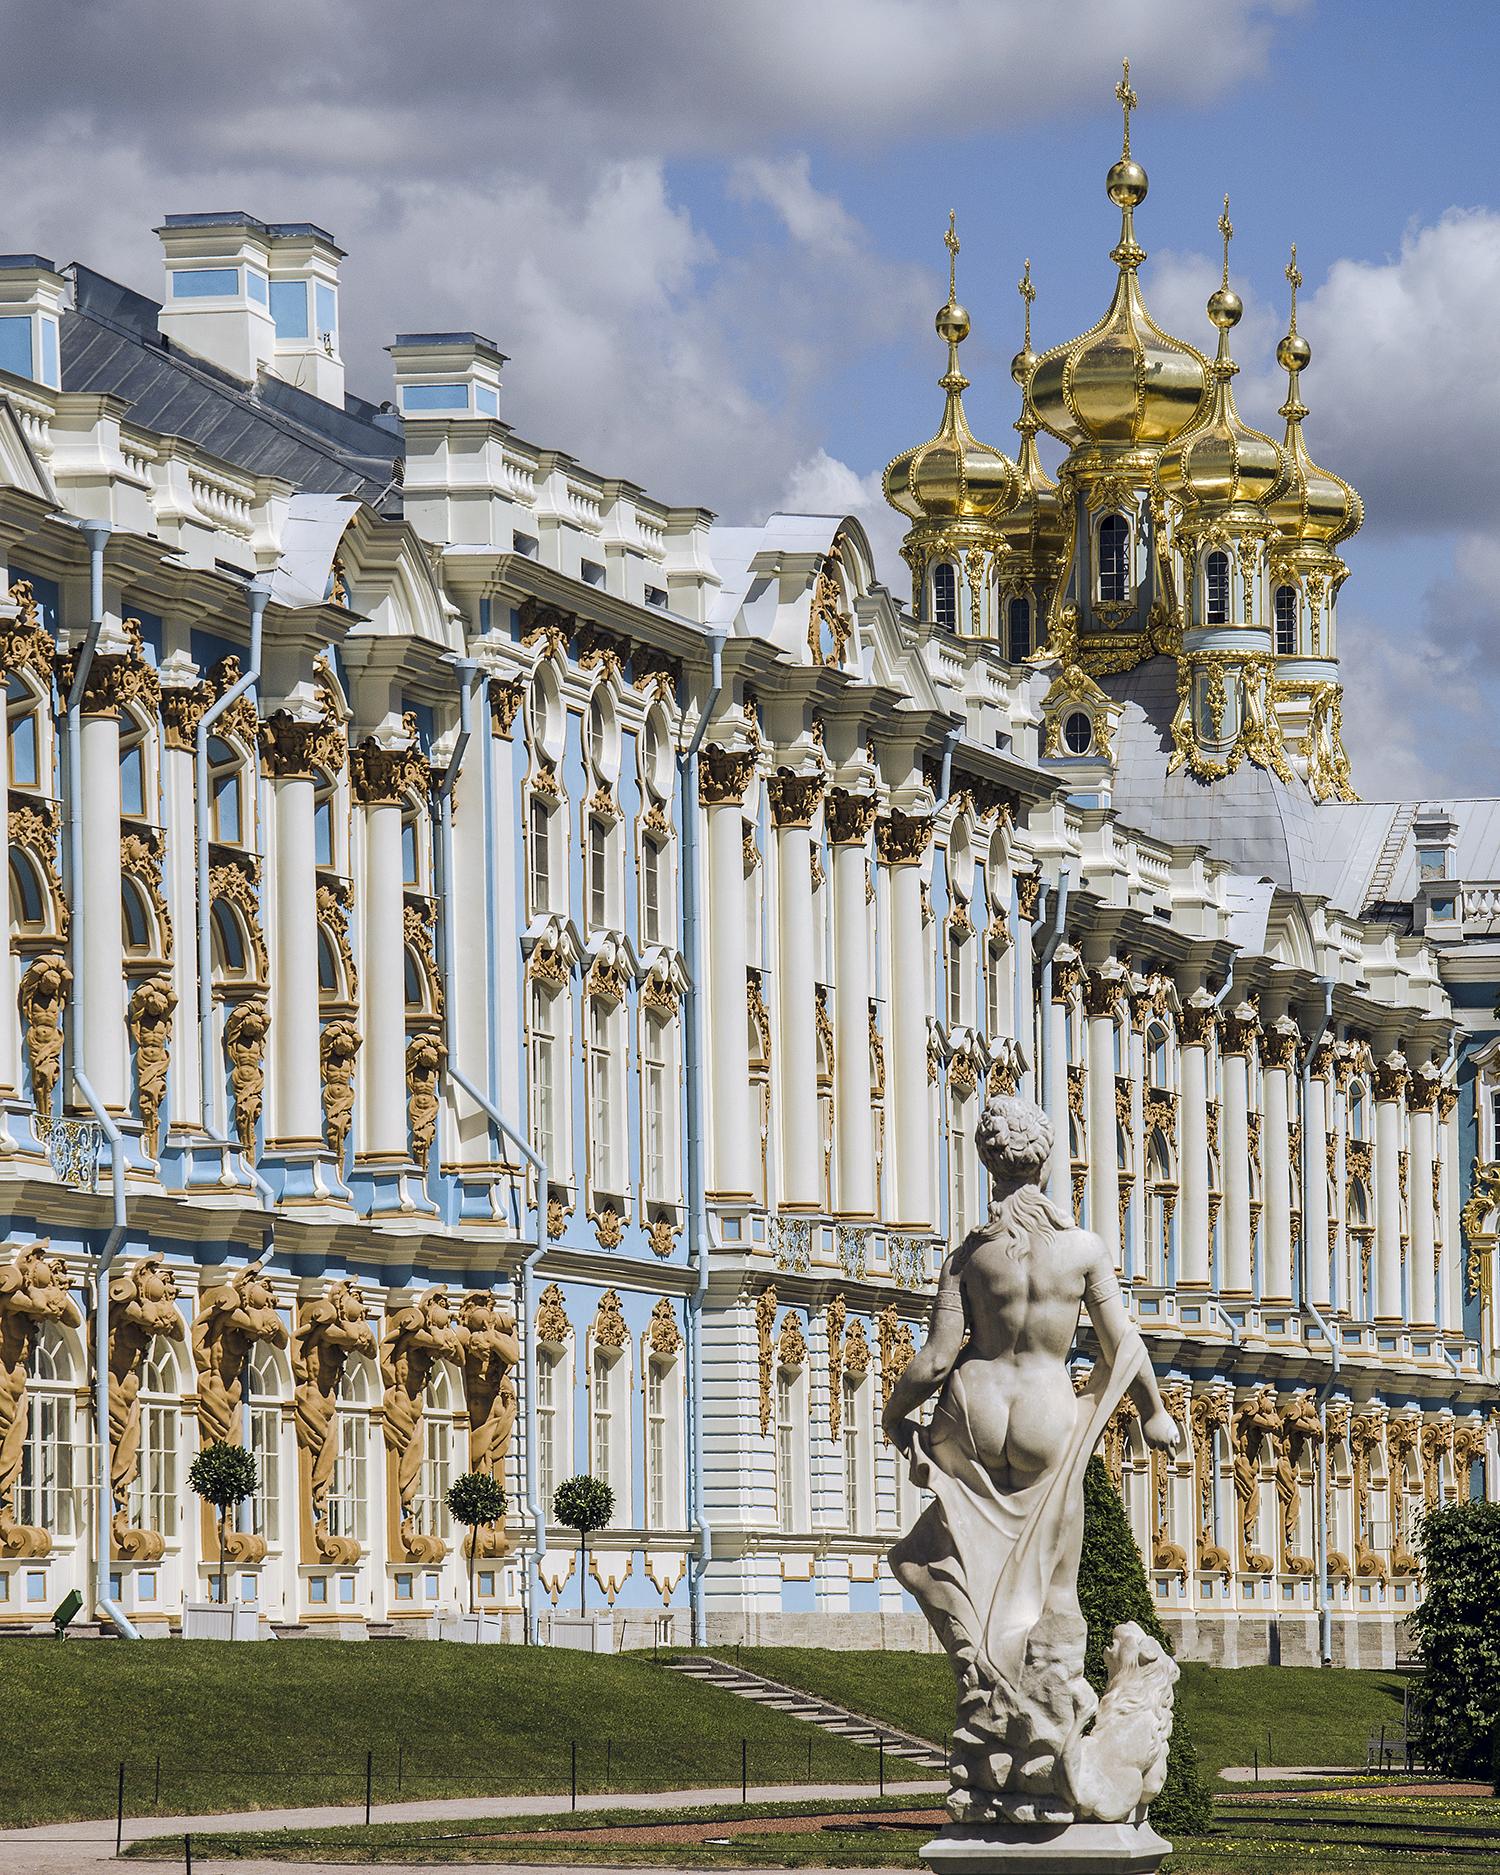 S. Pietroburgo-palazzo di Caterina-8145.jpg